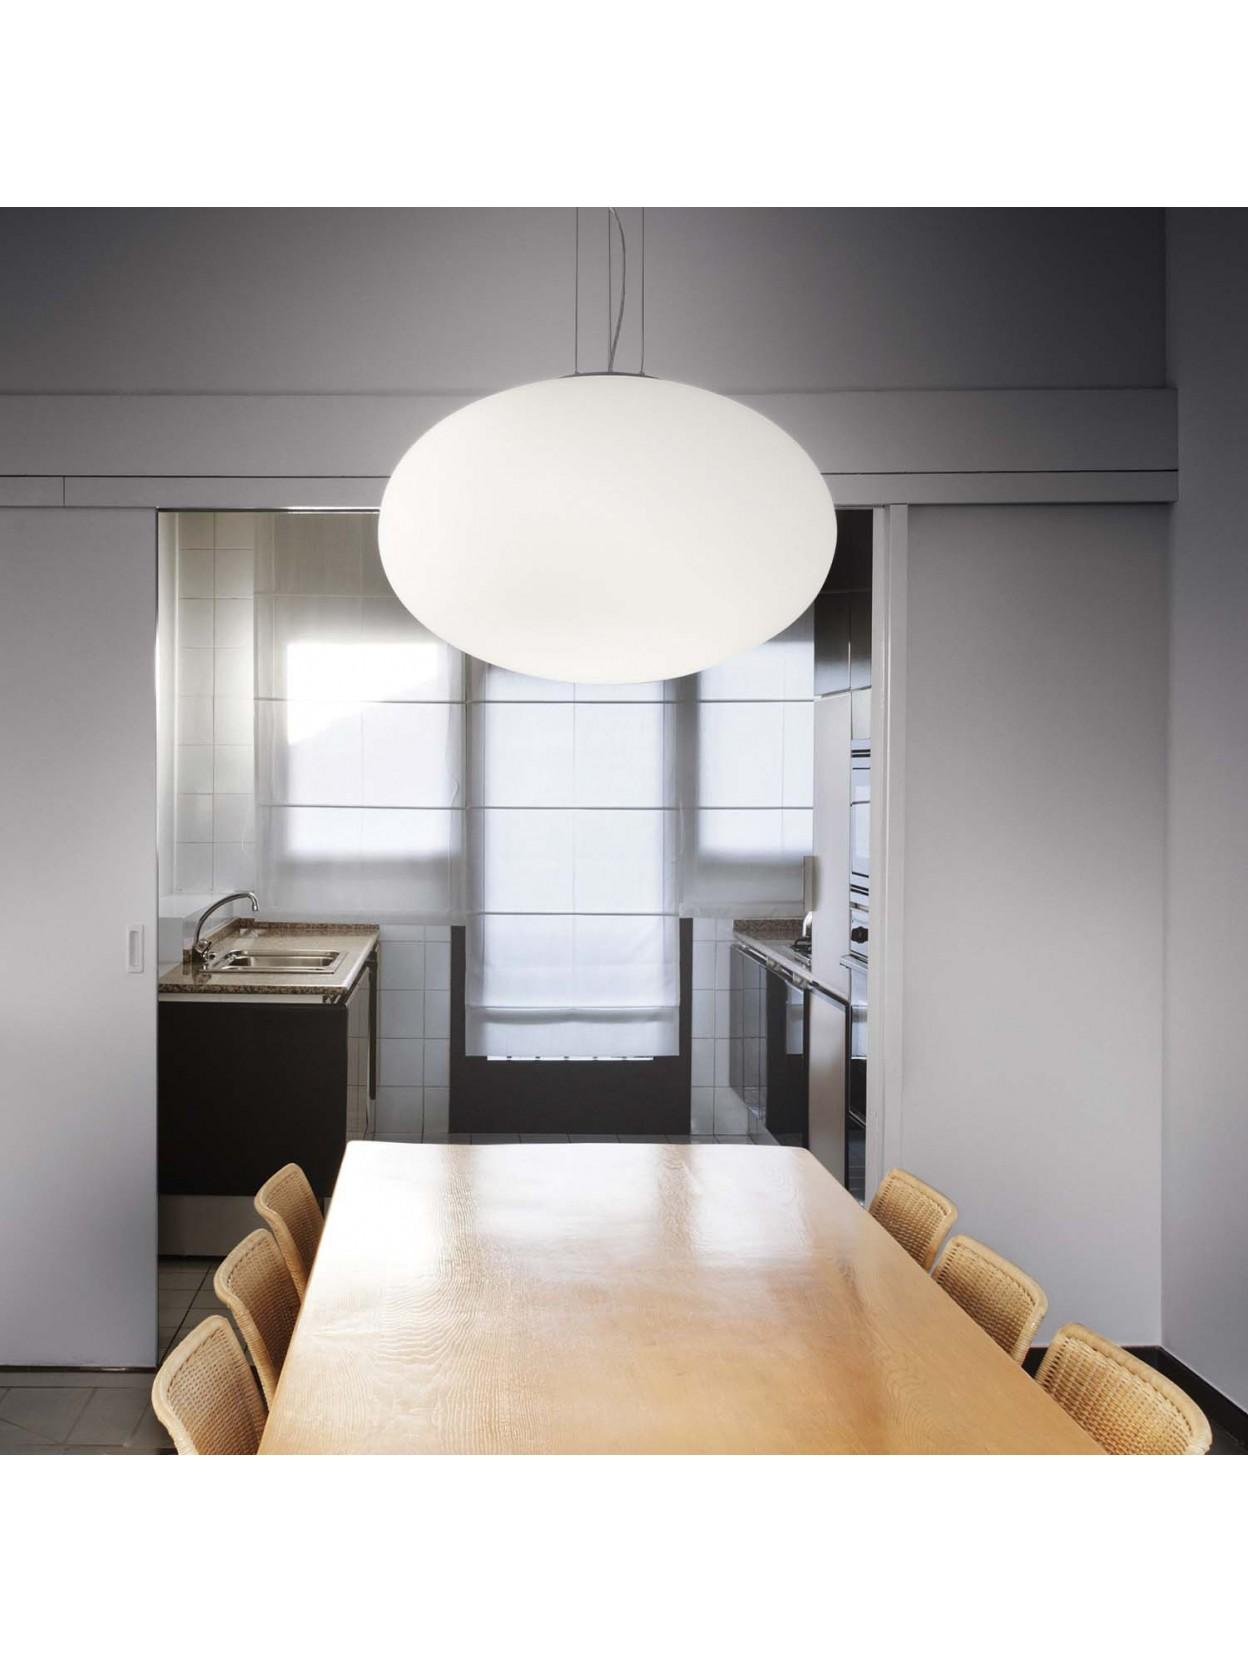 Lampadario moderno in vetro bianco 1 luce Candy d50